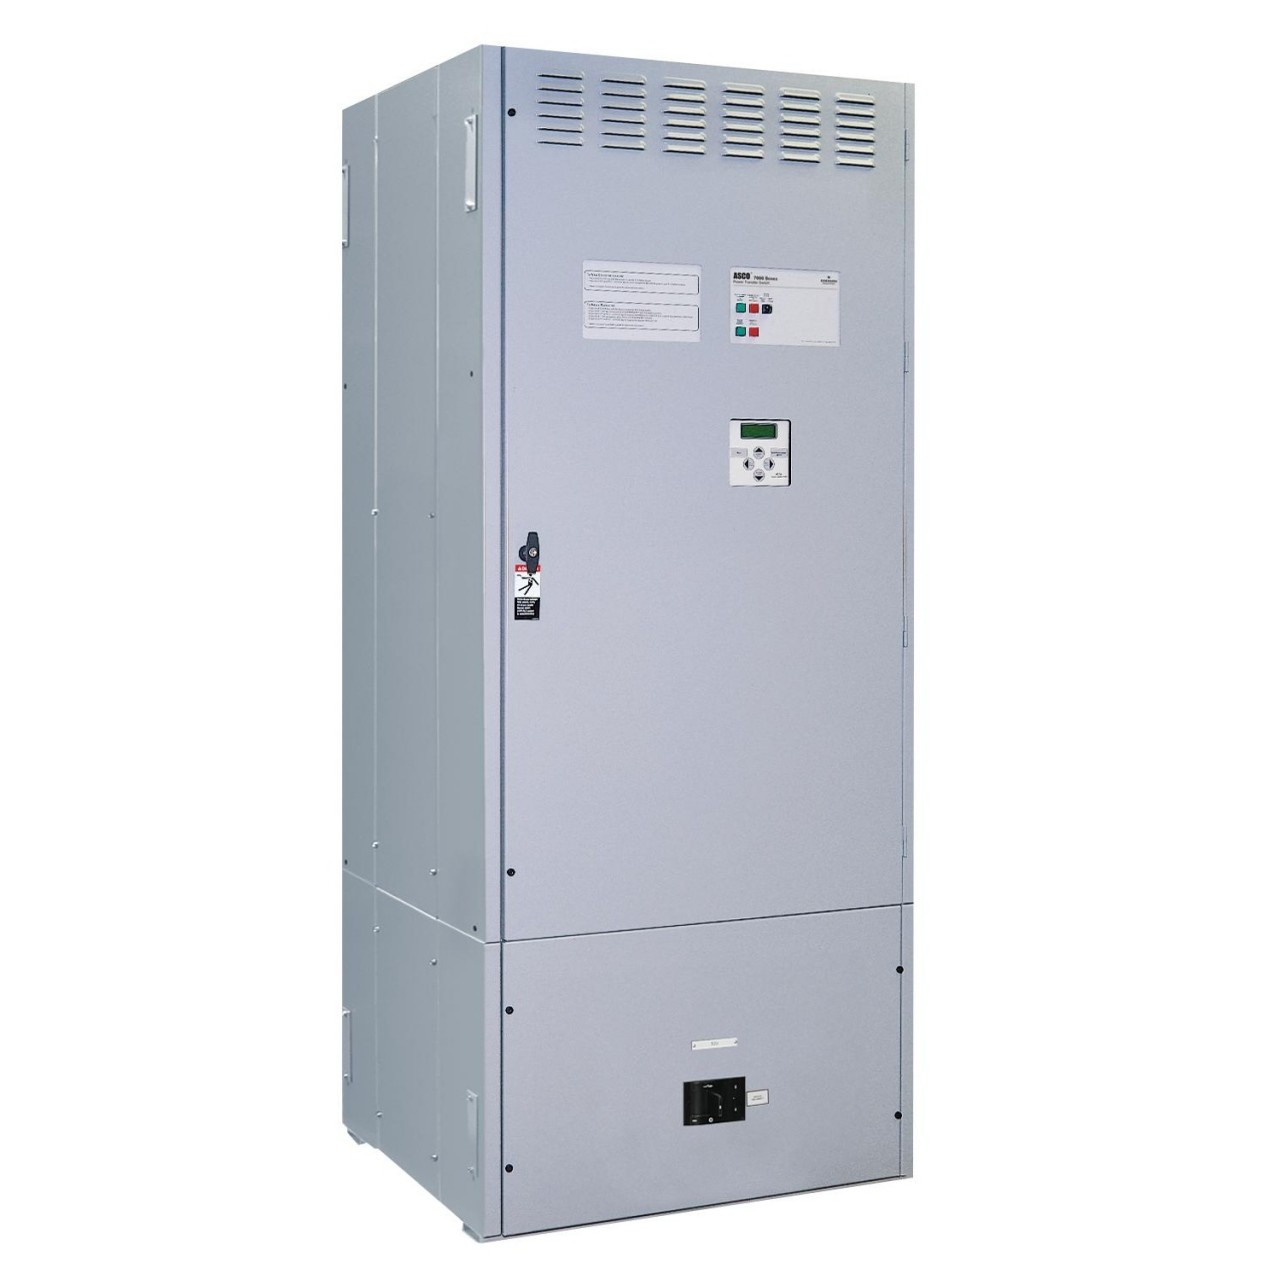 Asco 7000SE Auto Transfer Switch (3Ph, 800A)